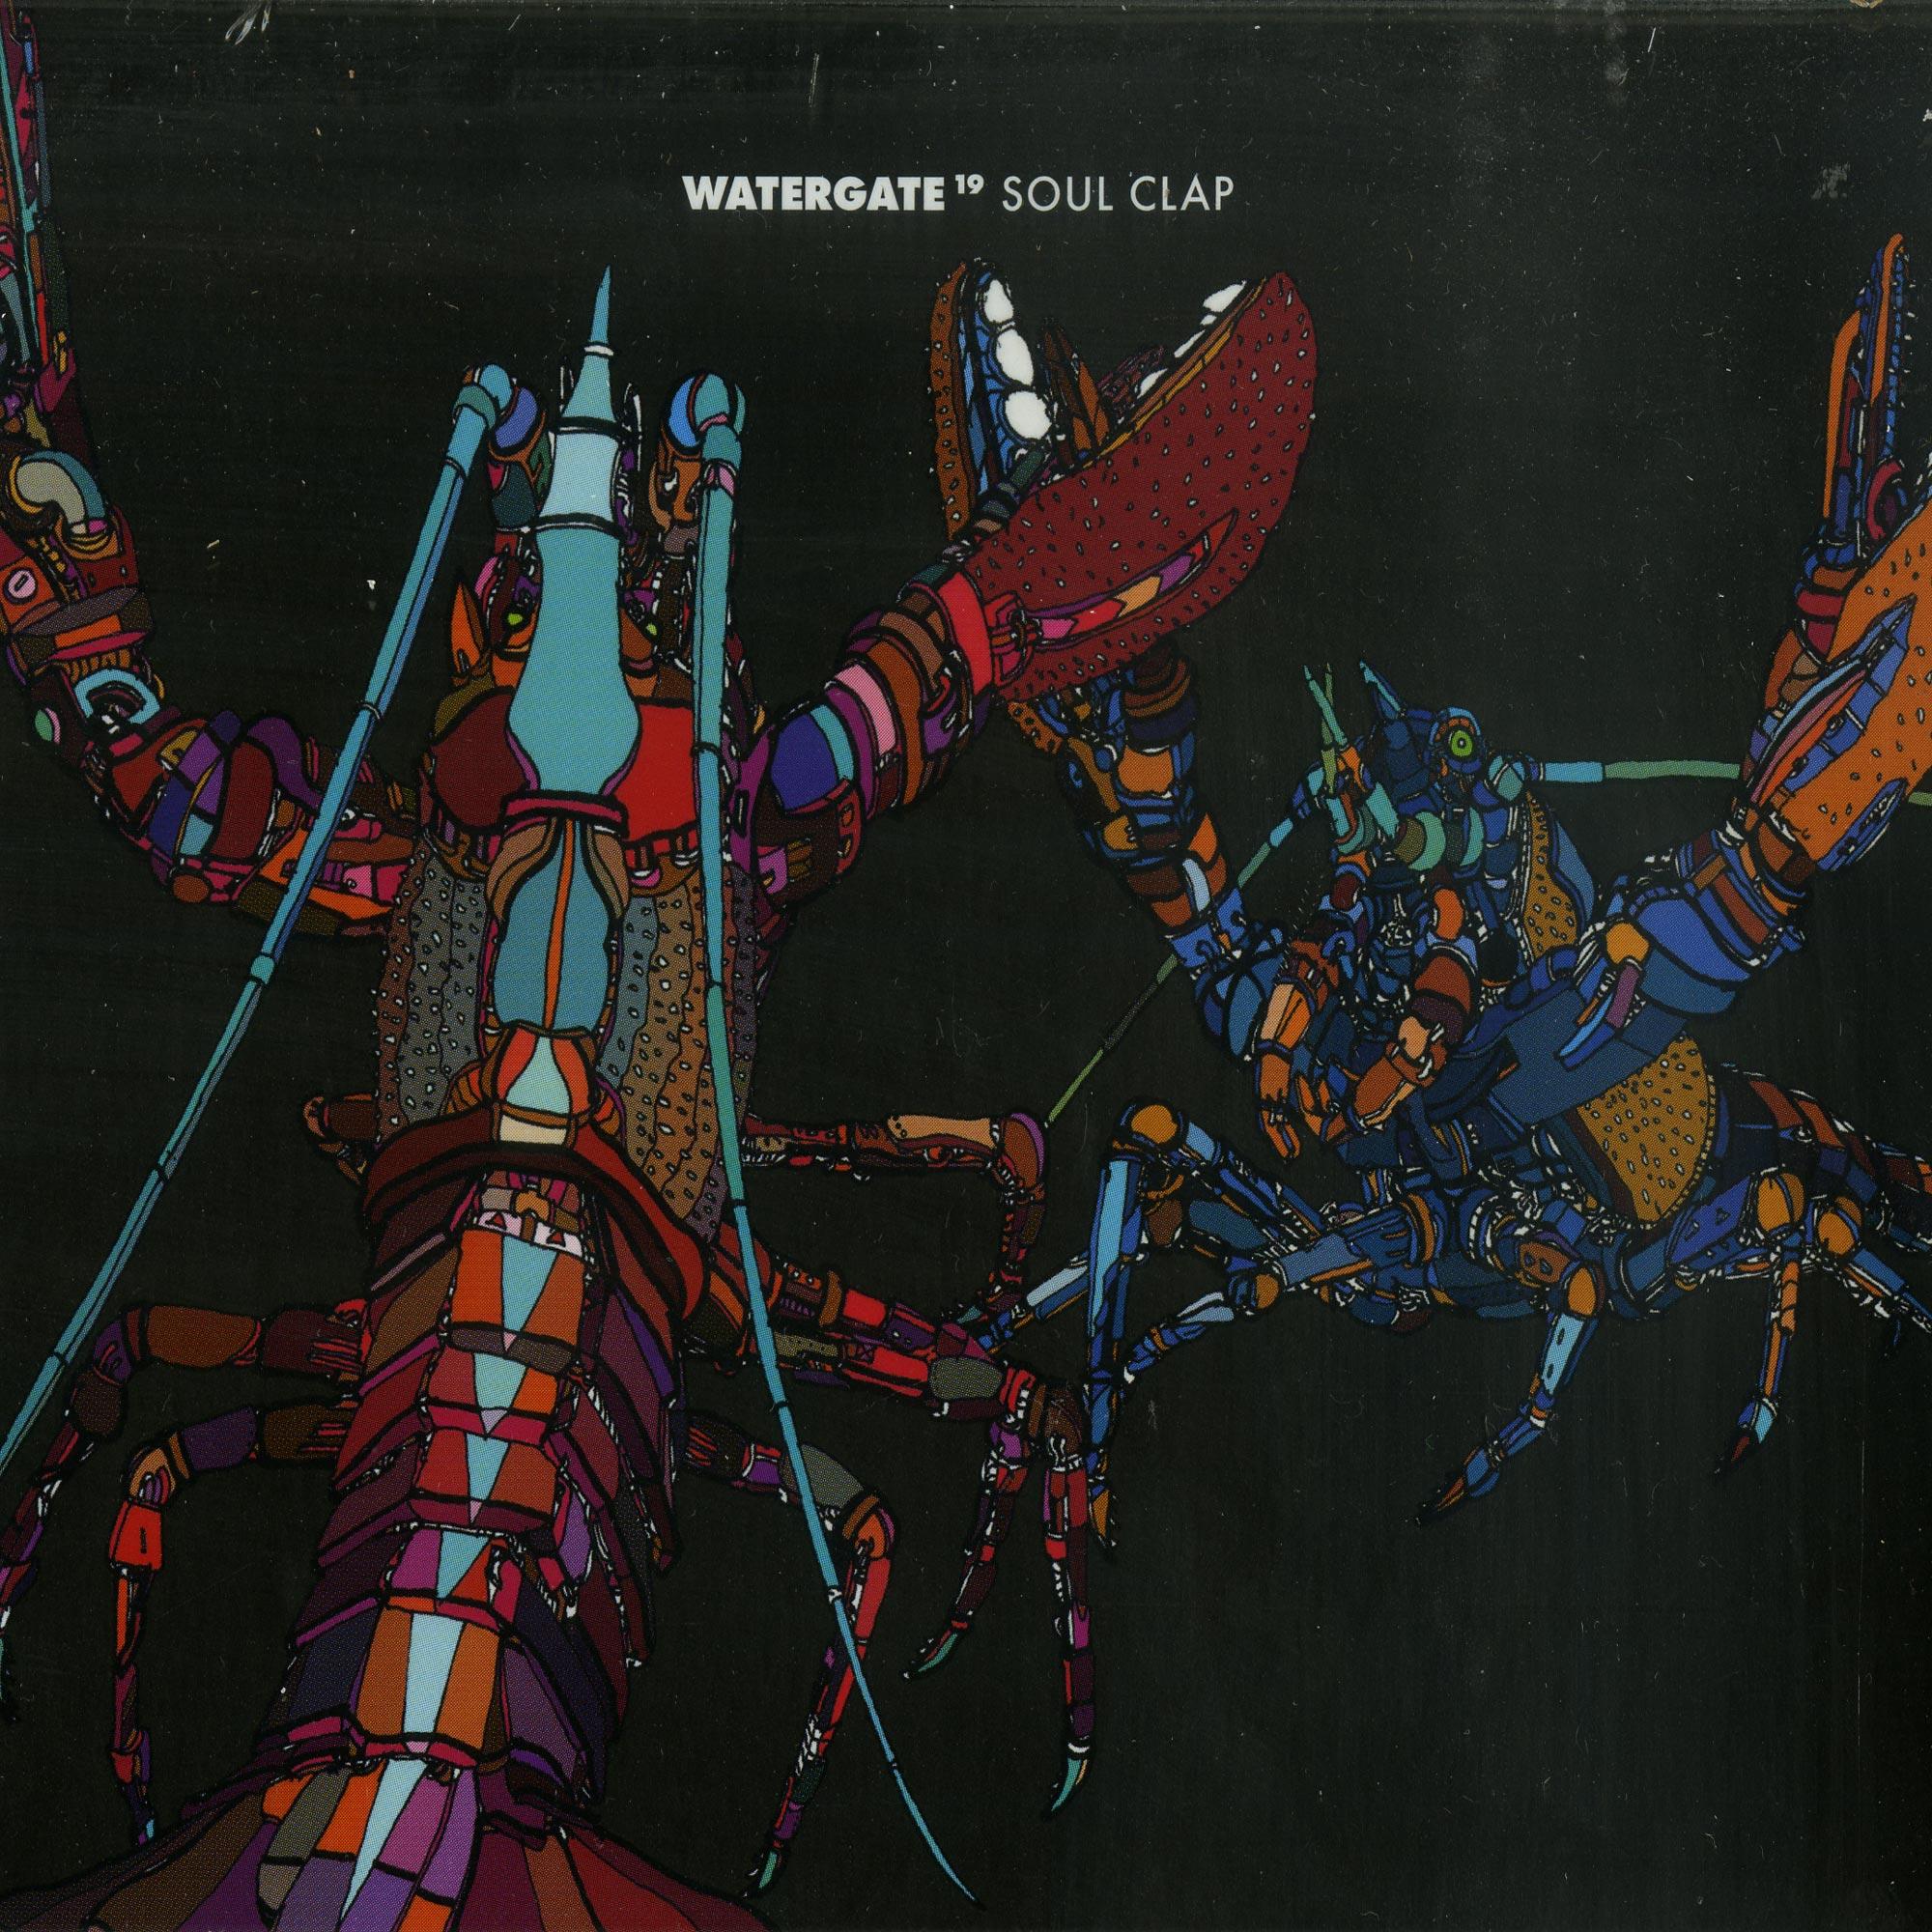 Soul Clap - WATERGATE 19